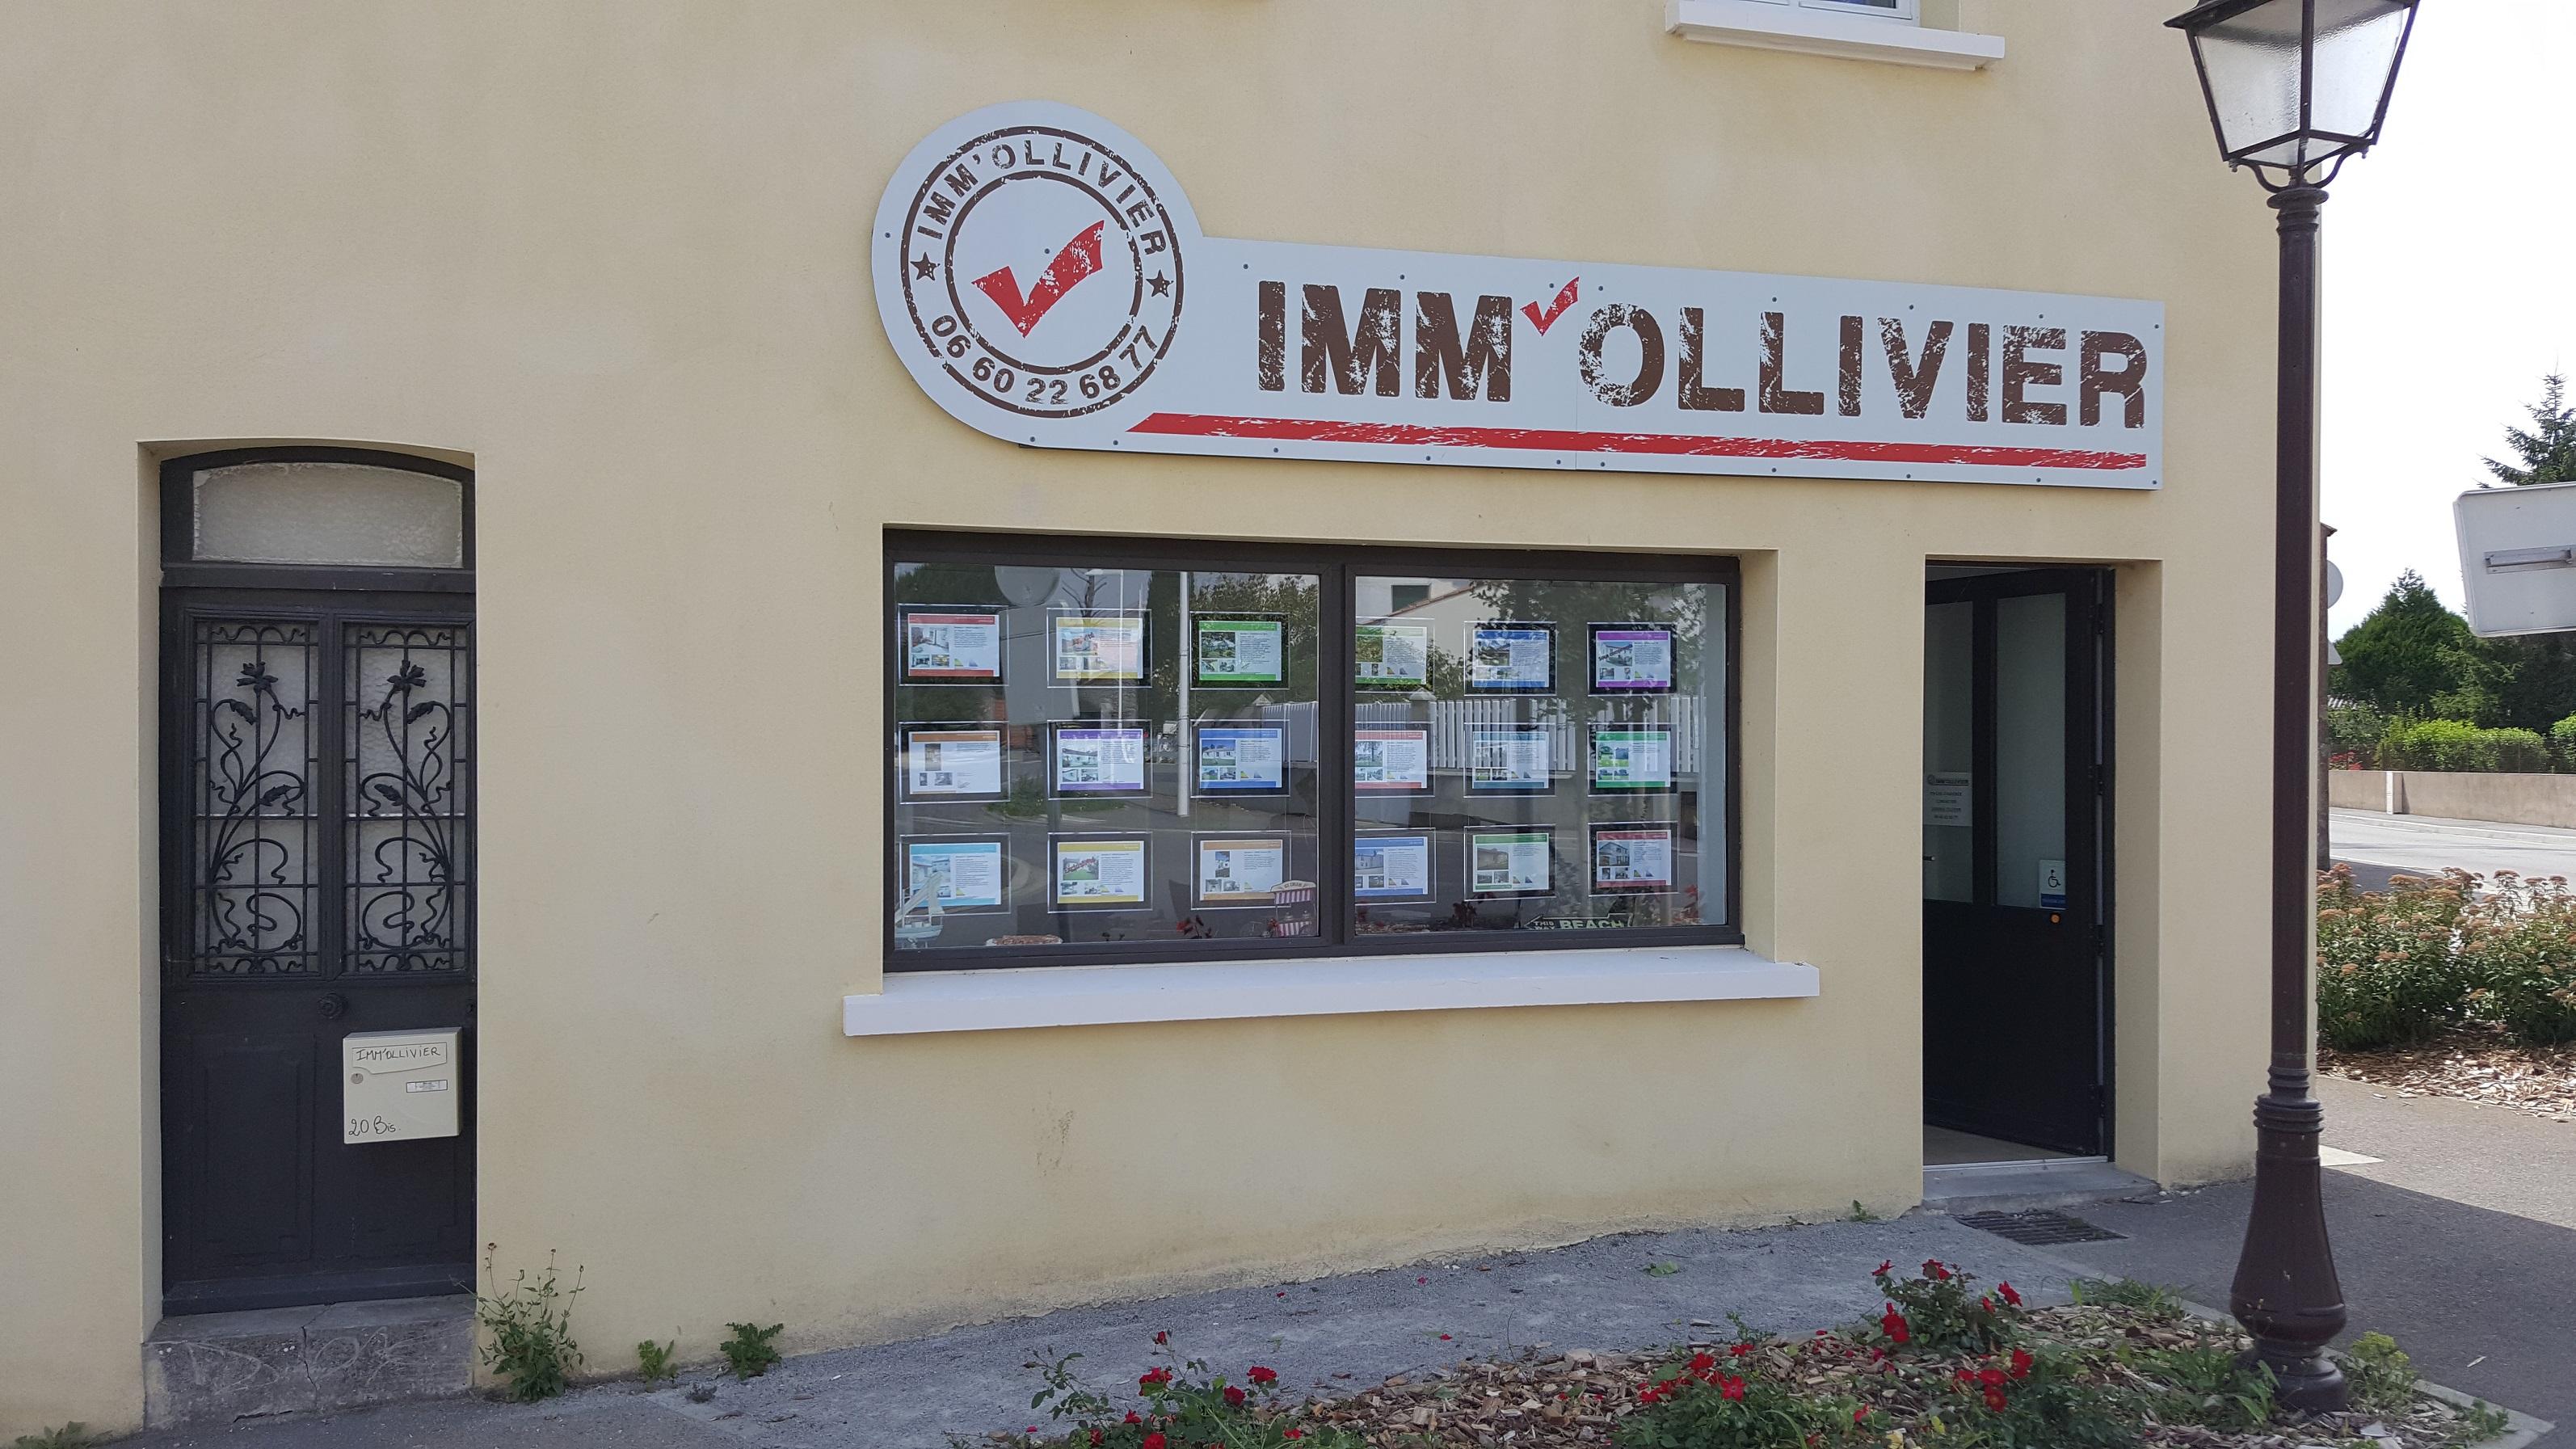 IMM OLLIVIER